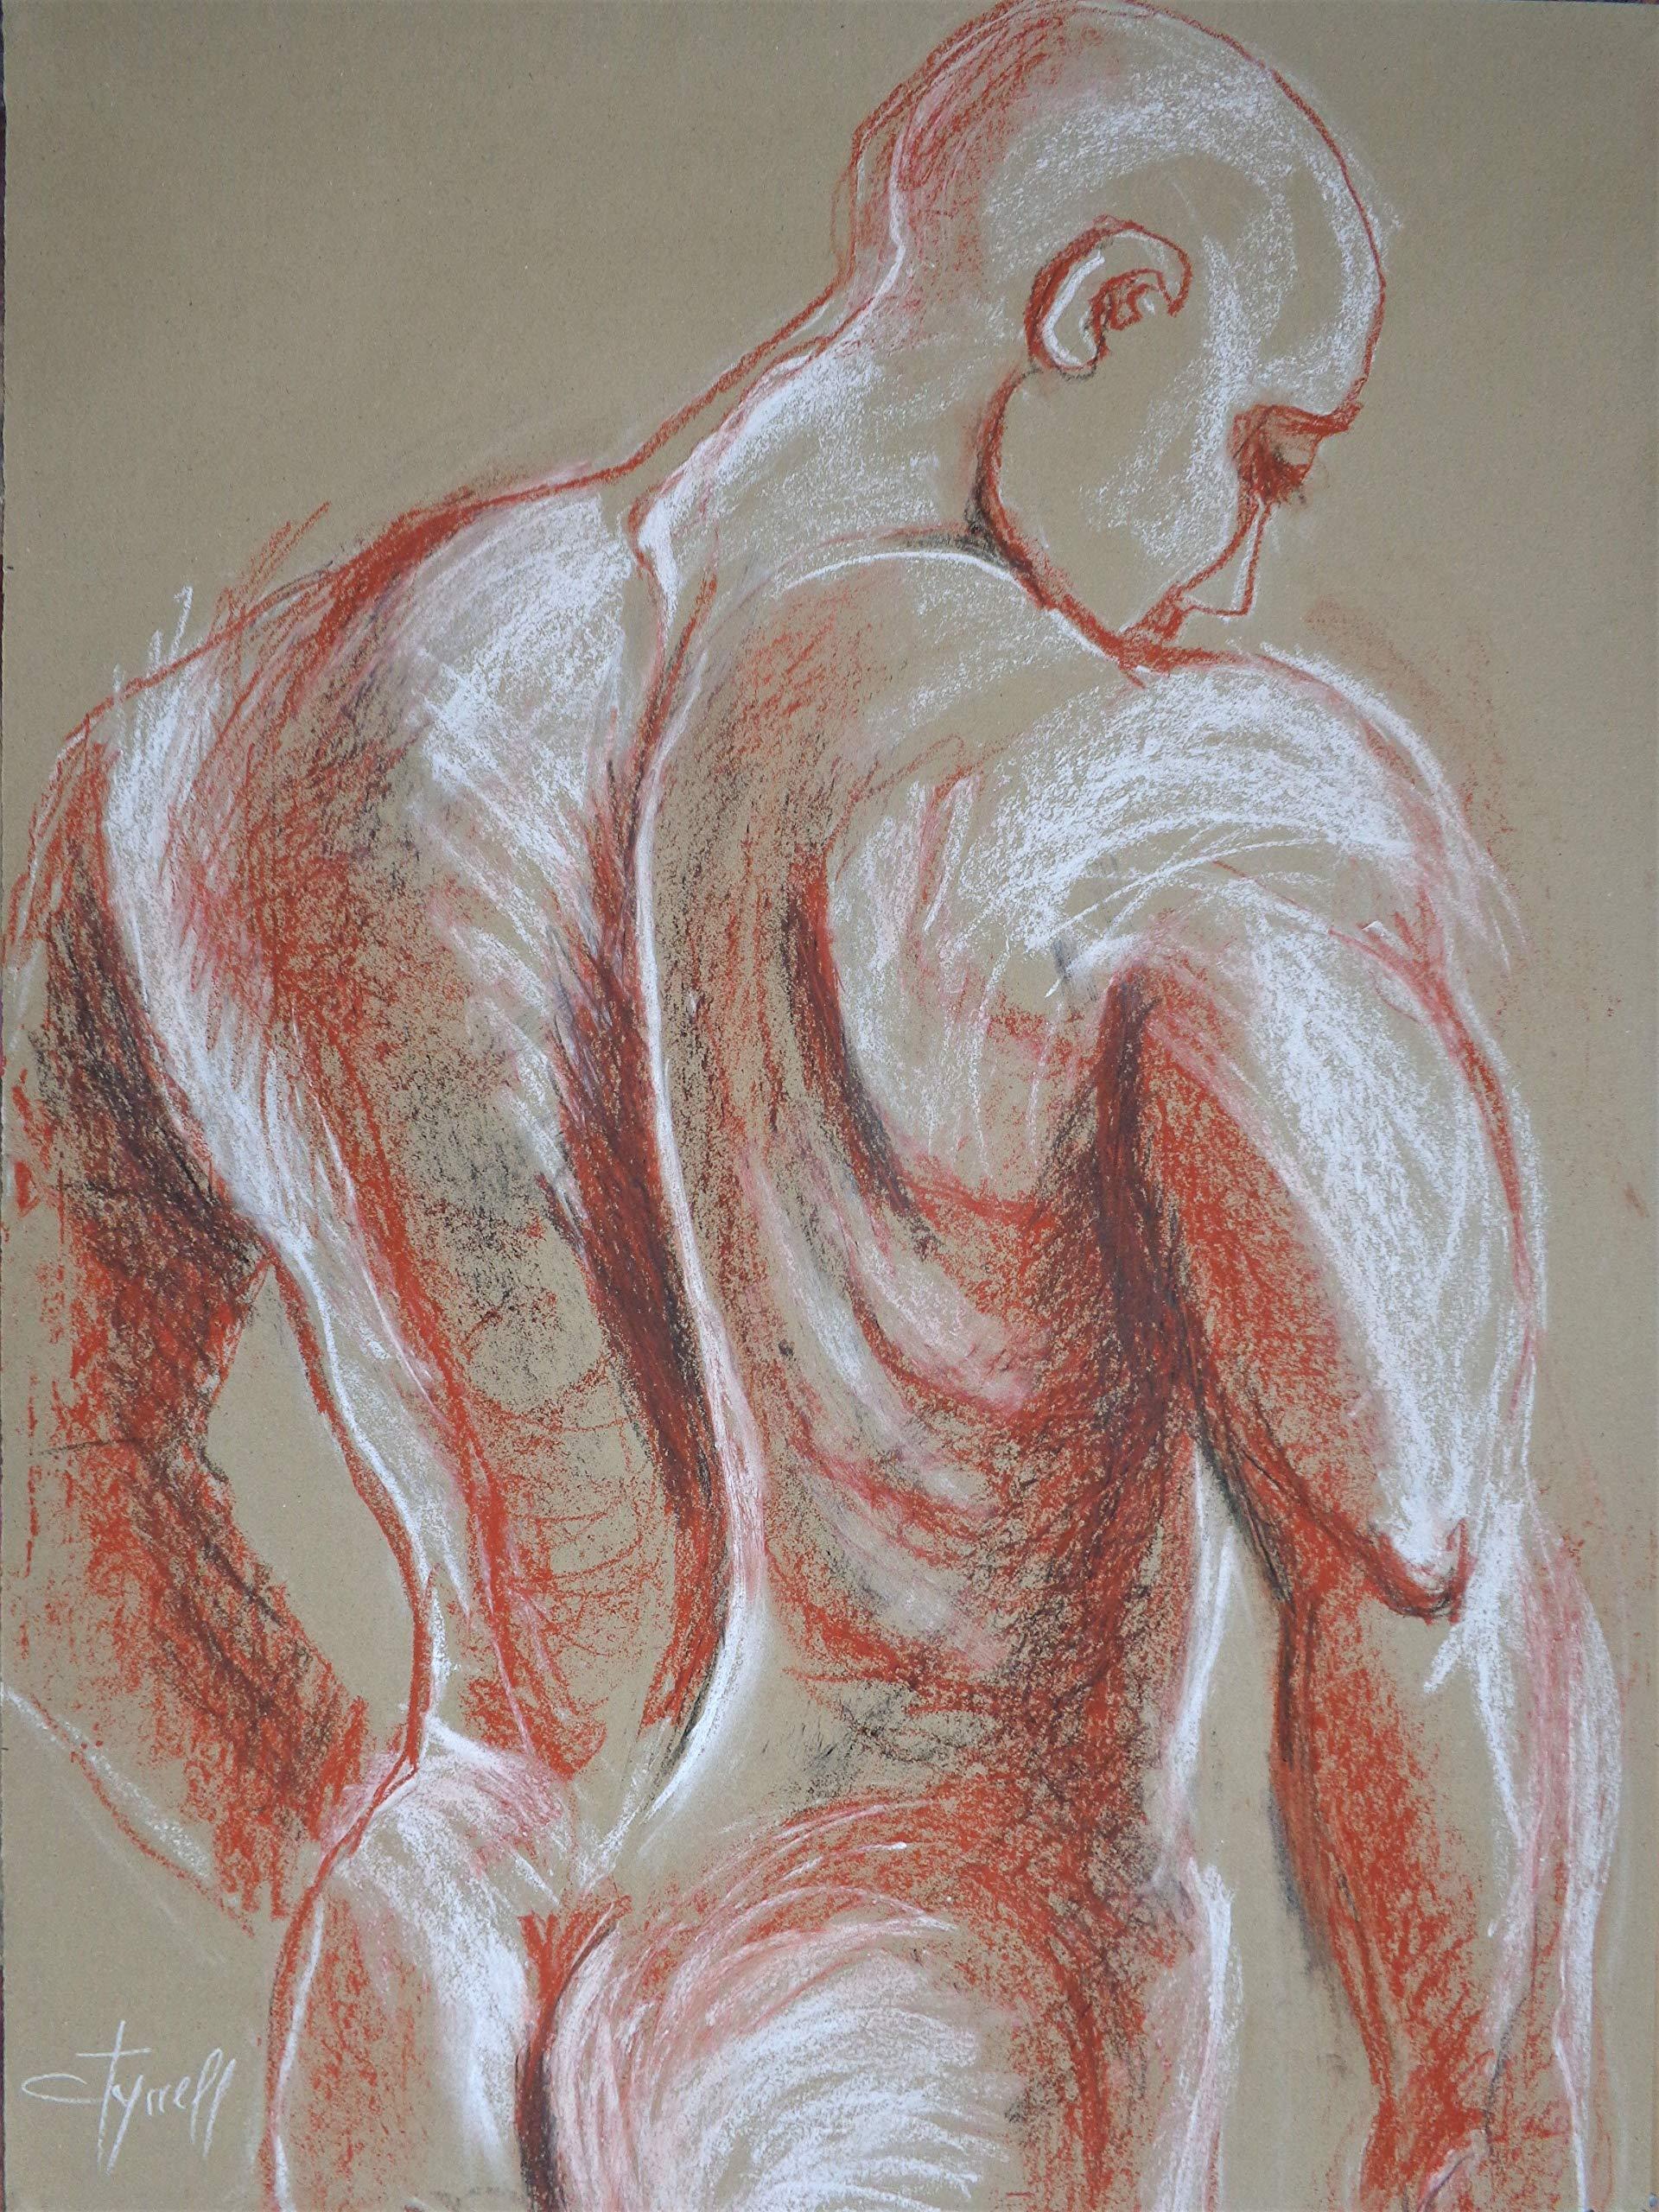 Man Nude Figure 4 by